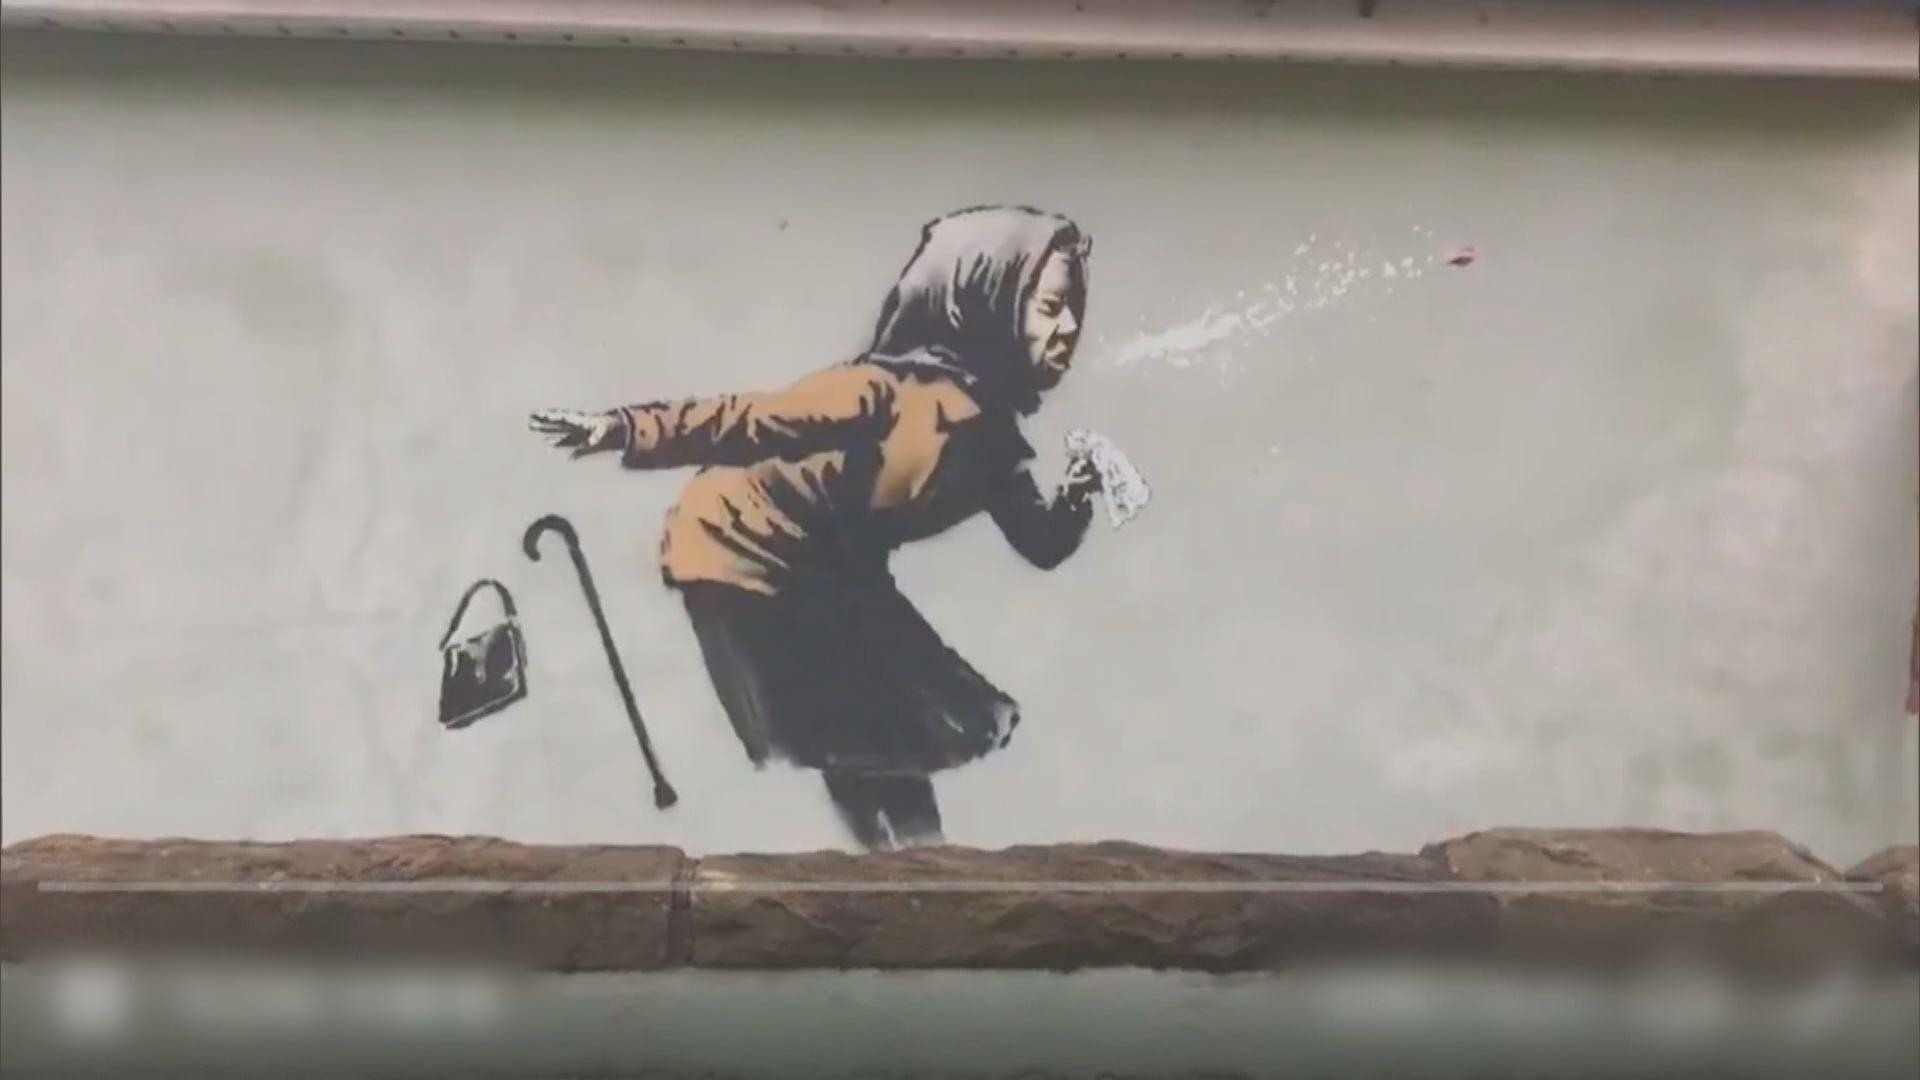 【環球薈報】Banksy發表新作《Aachoo!!》